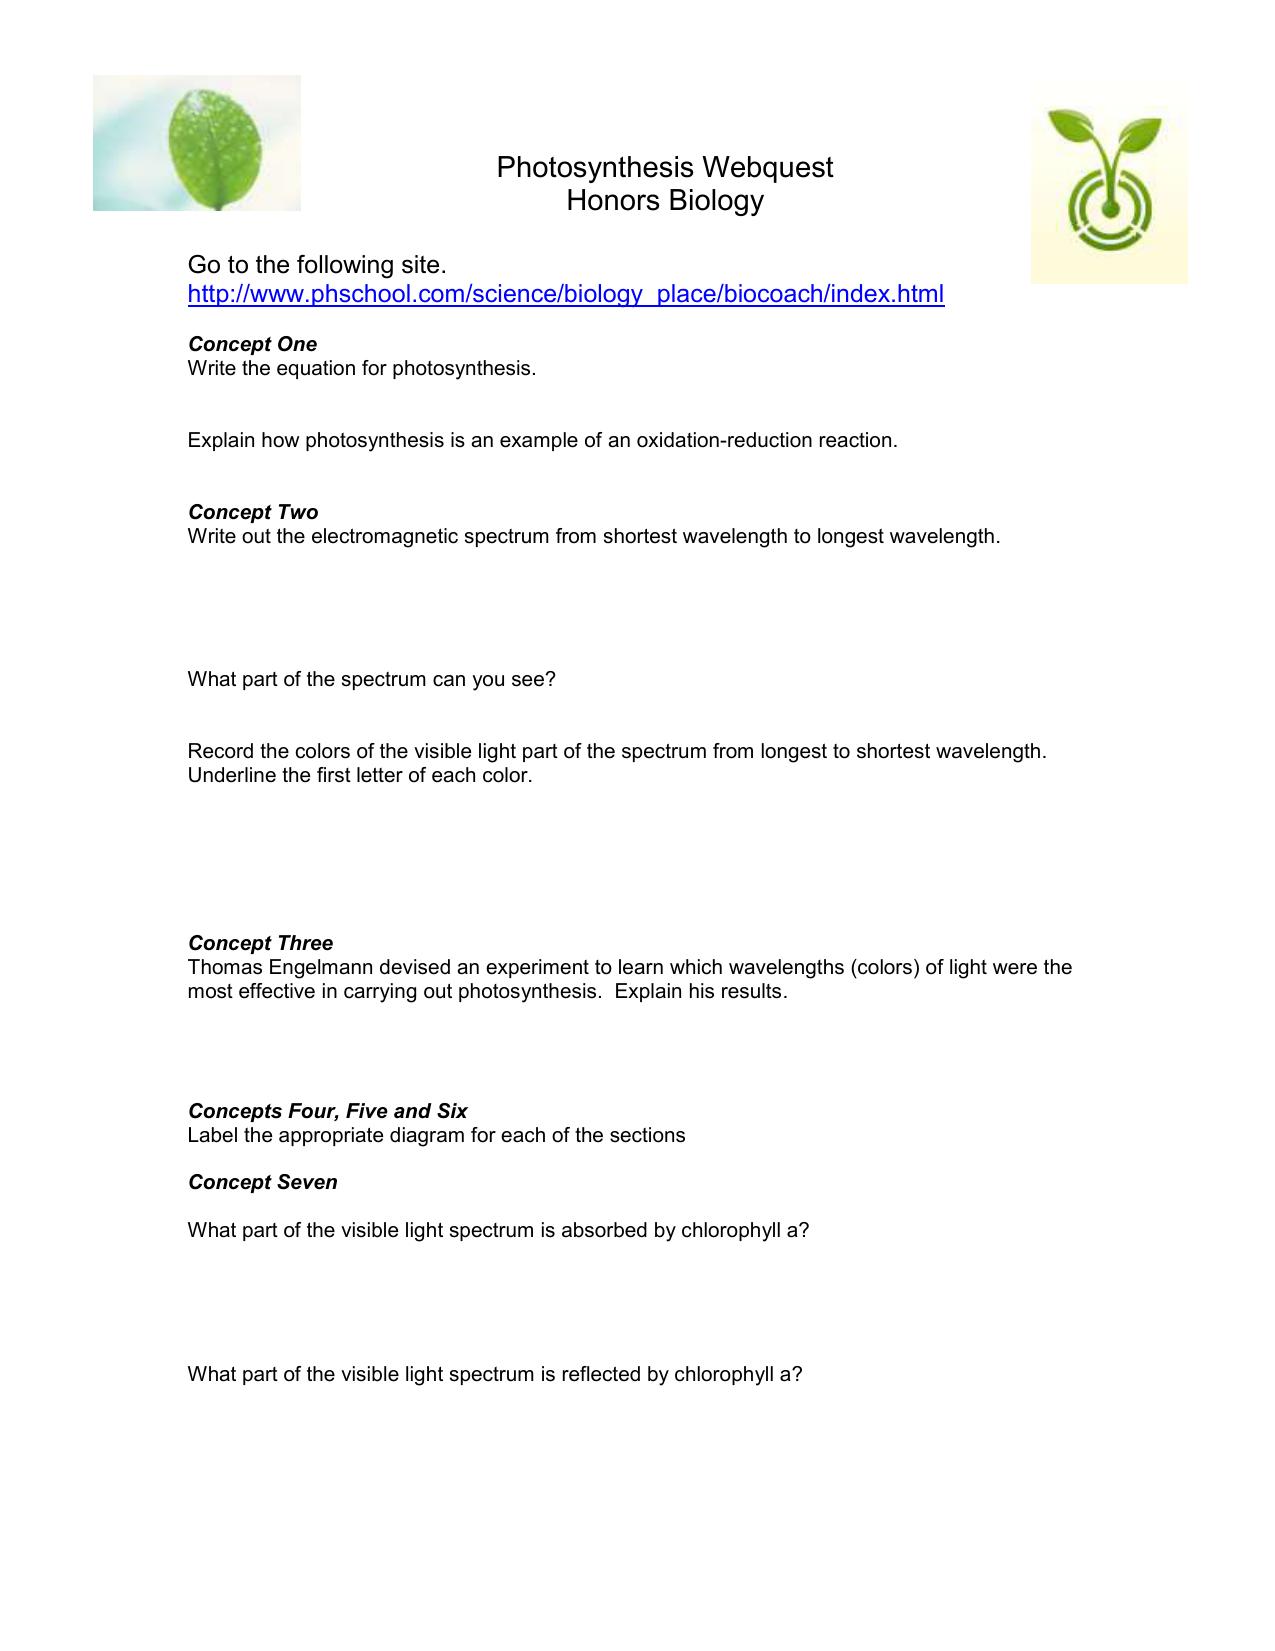 Photosynthesis webquest ccuart Choice Image